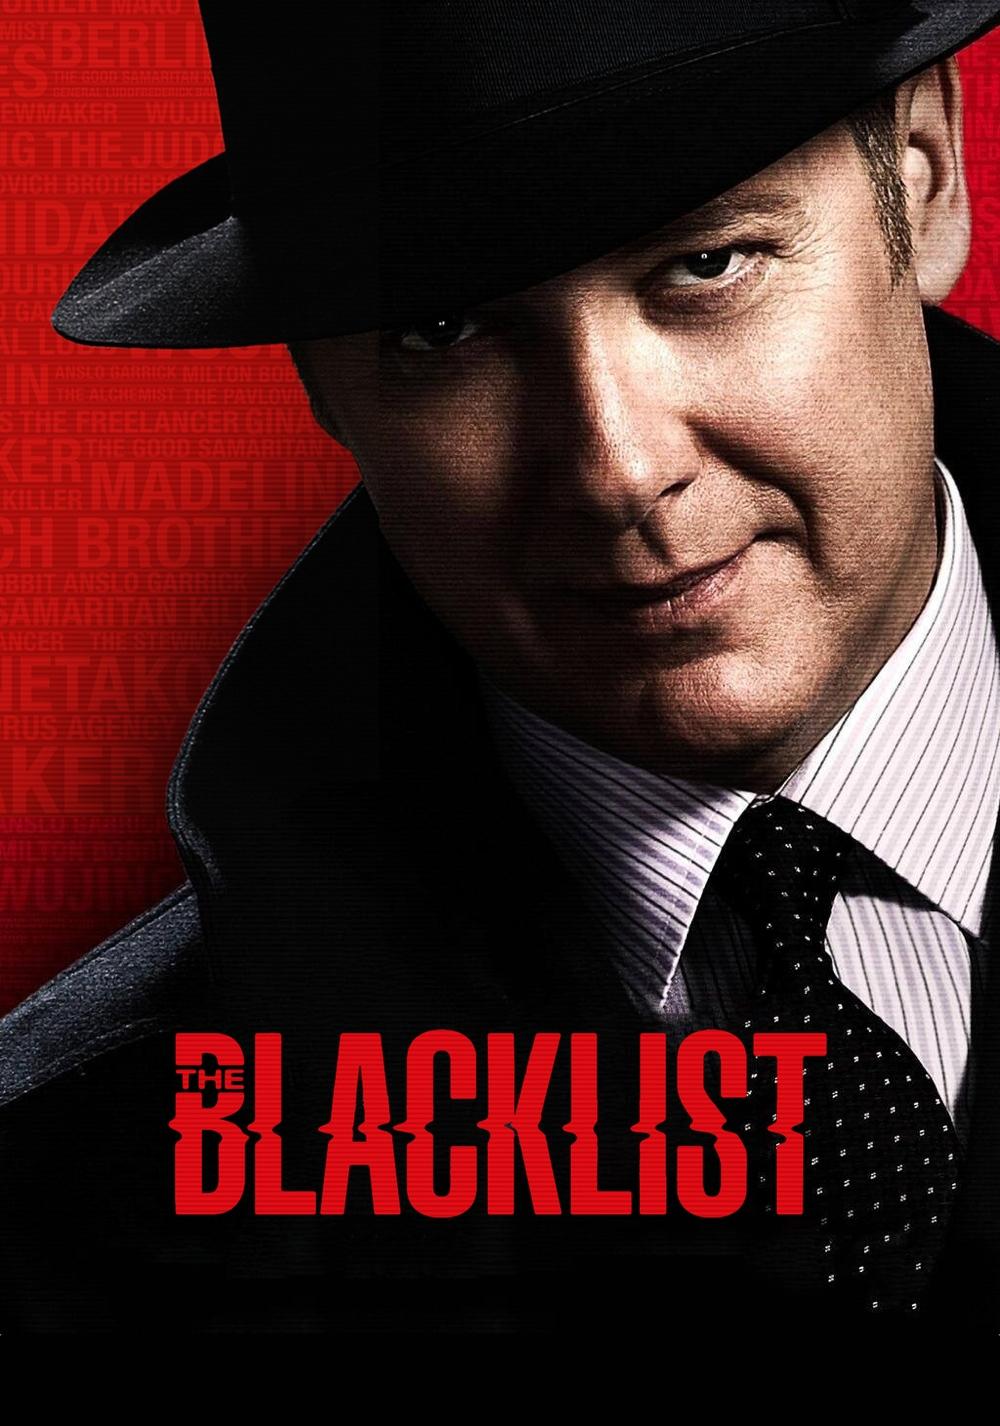 Blackist